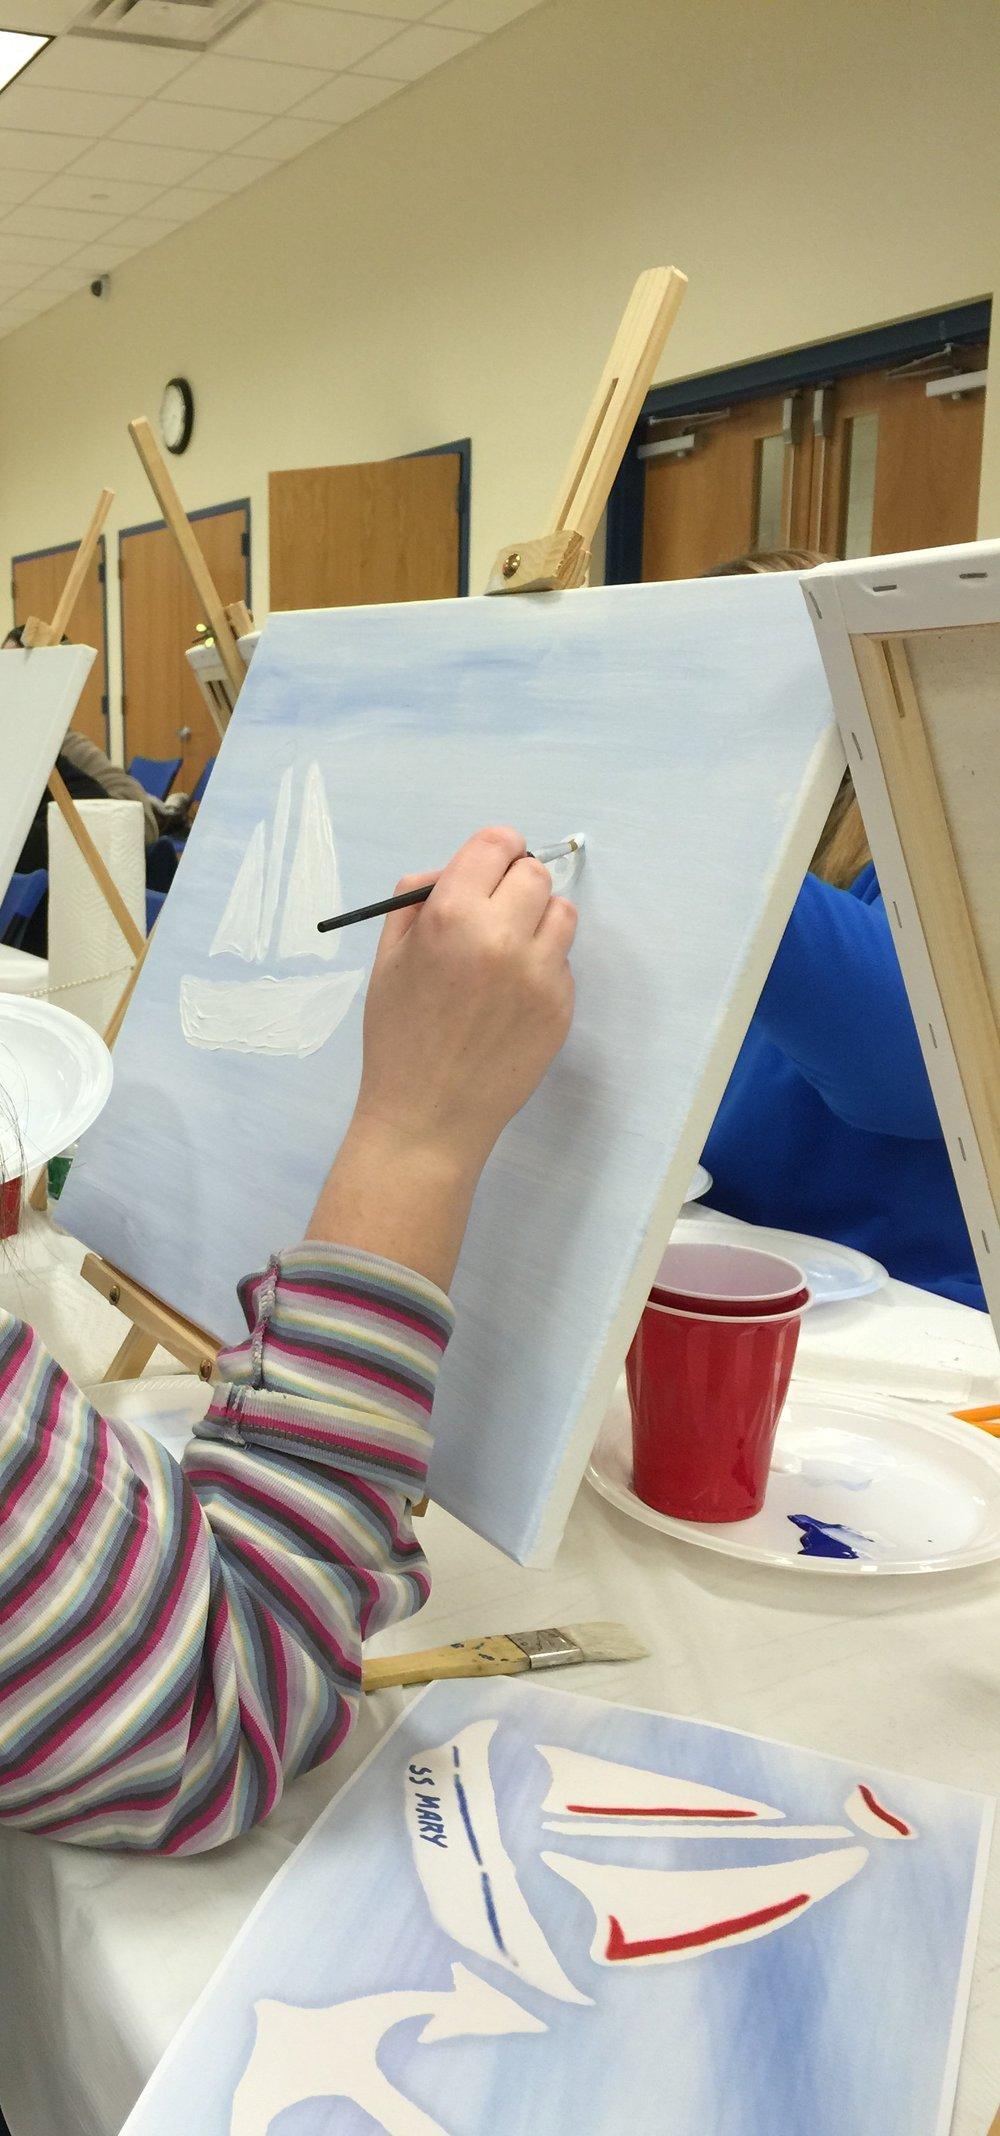 painting esa.JPG